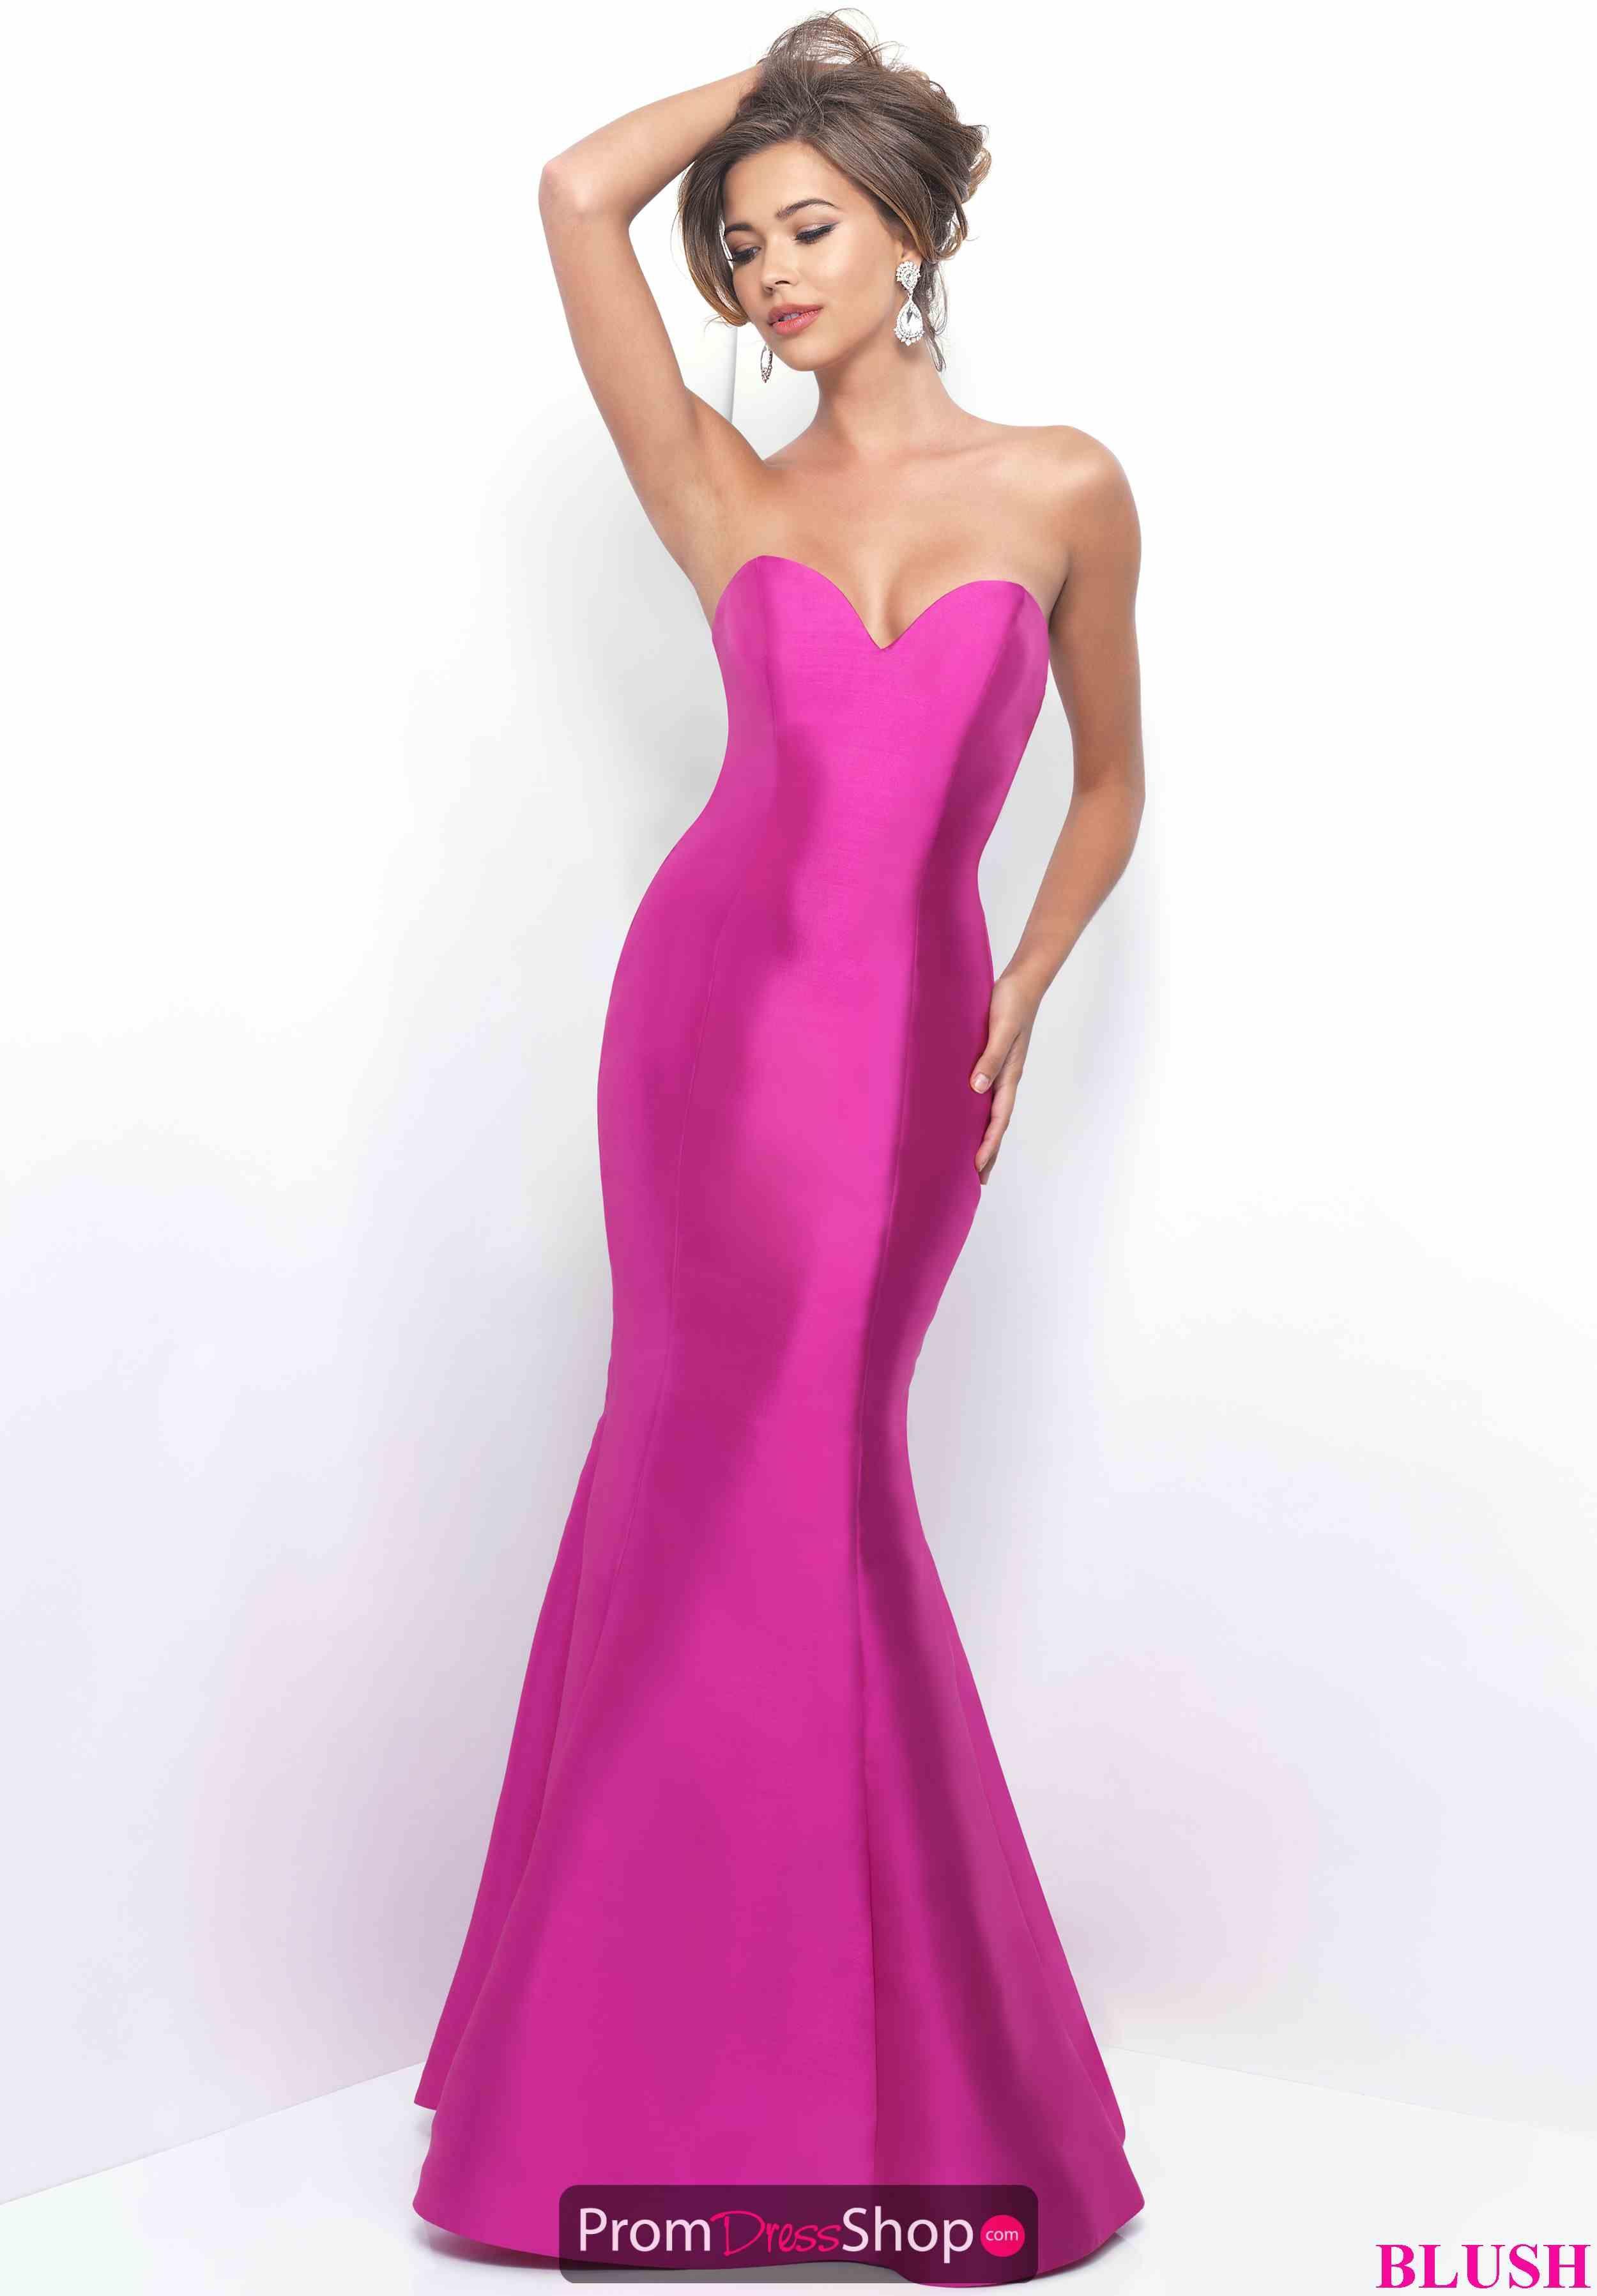 Sweetheart Neck Blush Mermaid Dress 11238 | Vestiditos